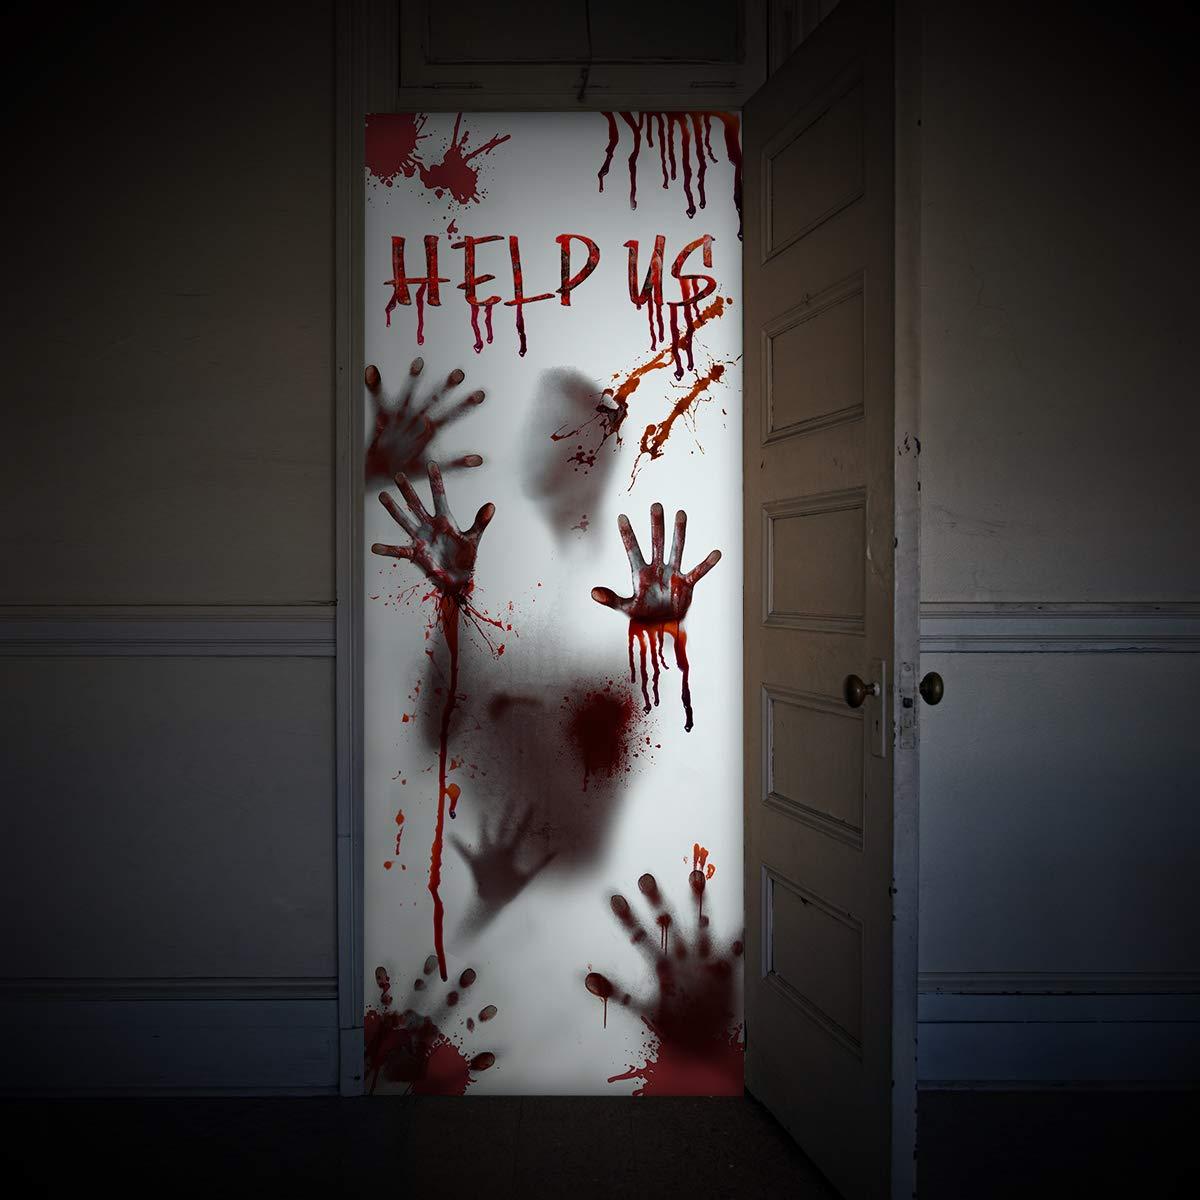 "Halloween Decorations for Window Wall, Scary Bloody Handprint Halloween Props Indoor, 80×35.5"" 80×35.5"